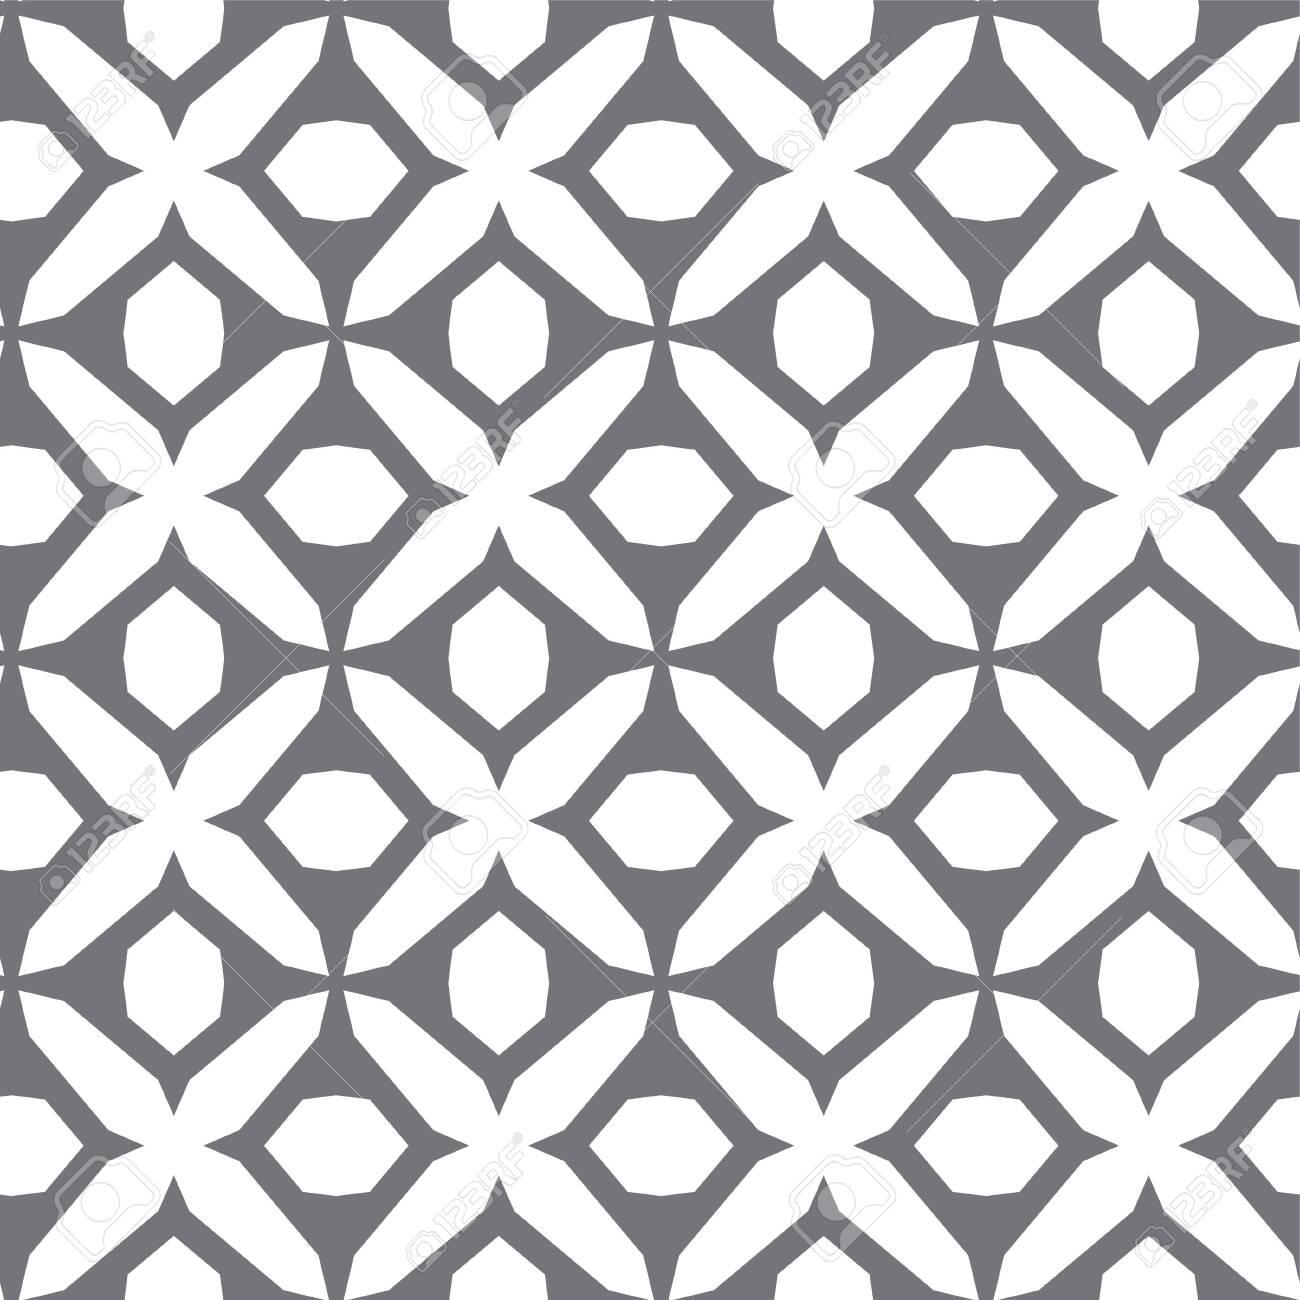 Seamless vector pattern in geometric ornamental style - 129525131